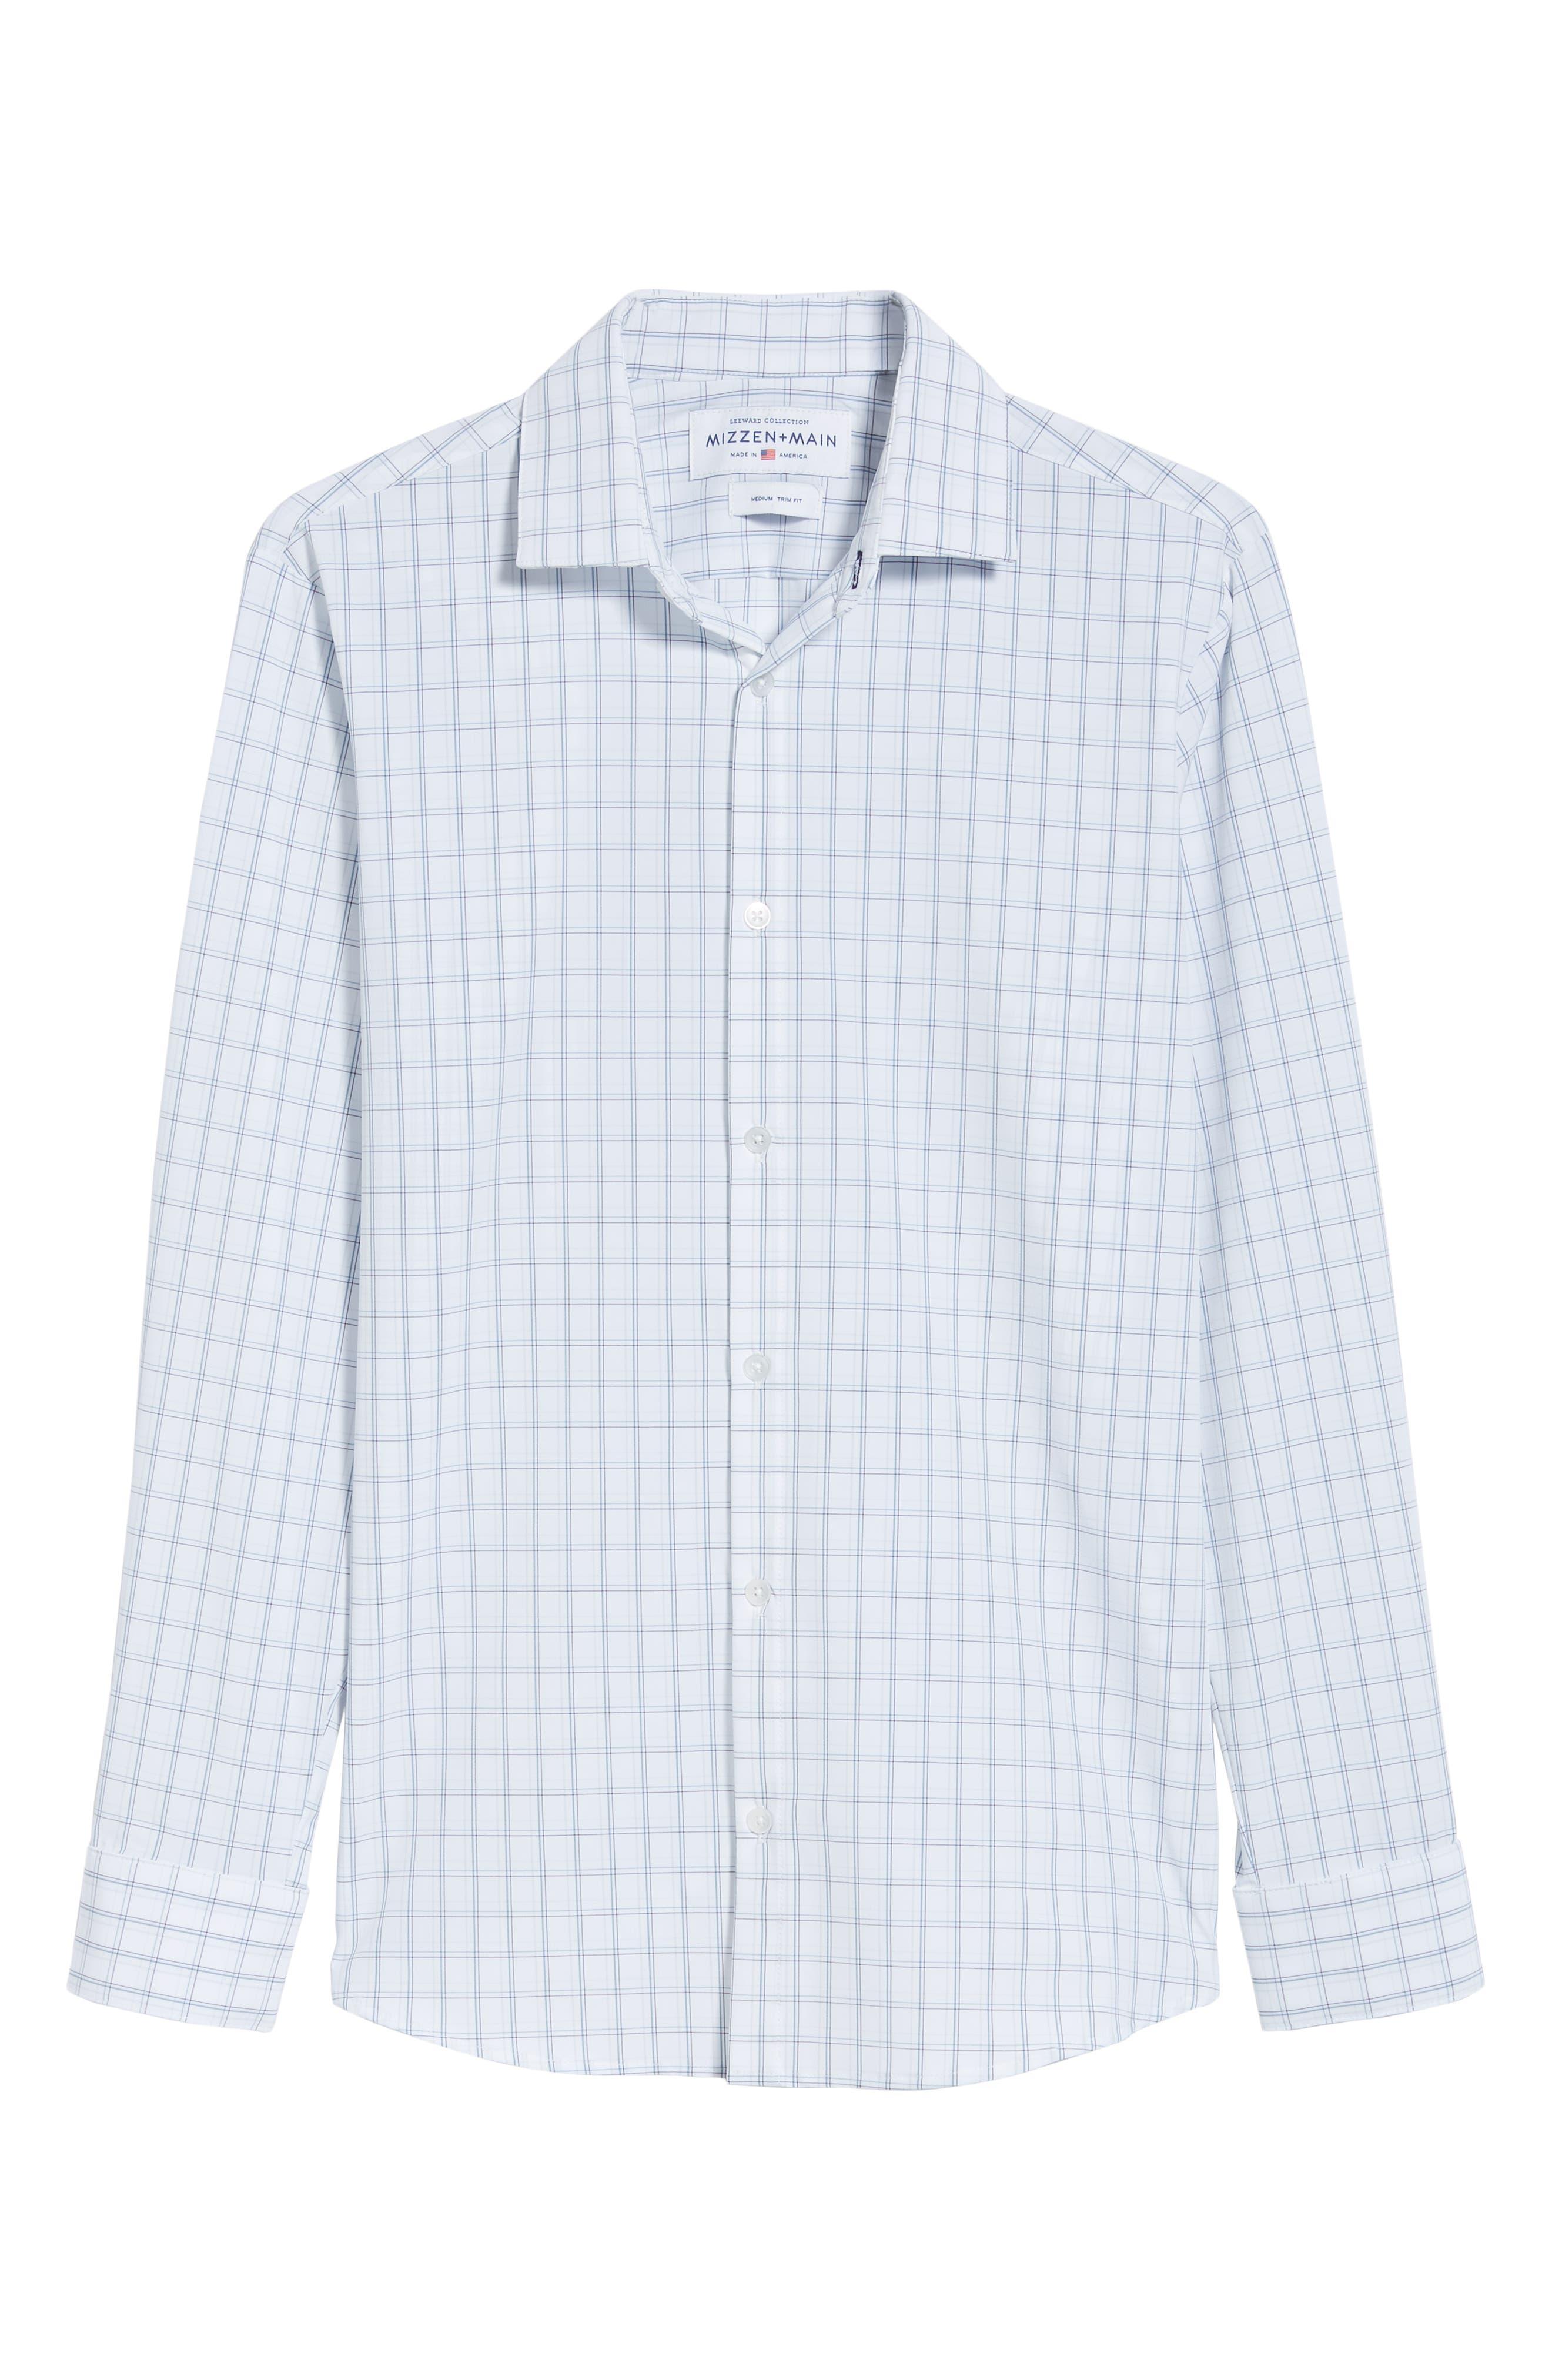 Sanders Slim Fit Check Performance Sport Shirt,                             Alternate thumbnail 5, color,                             WHITE